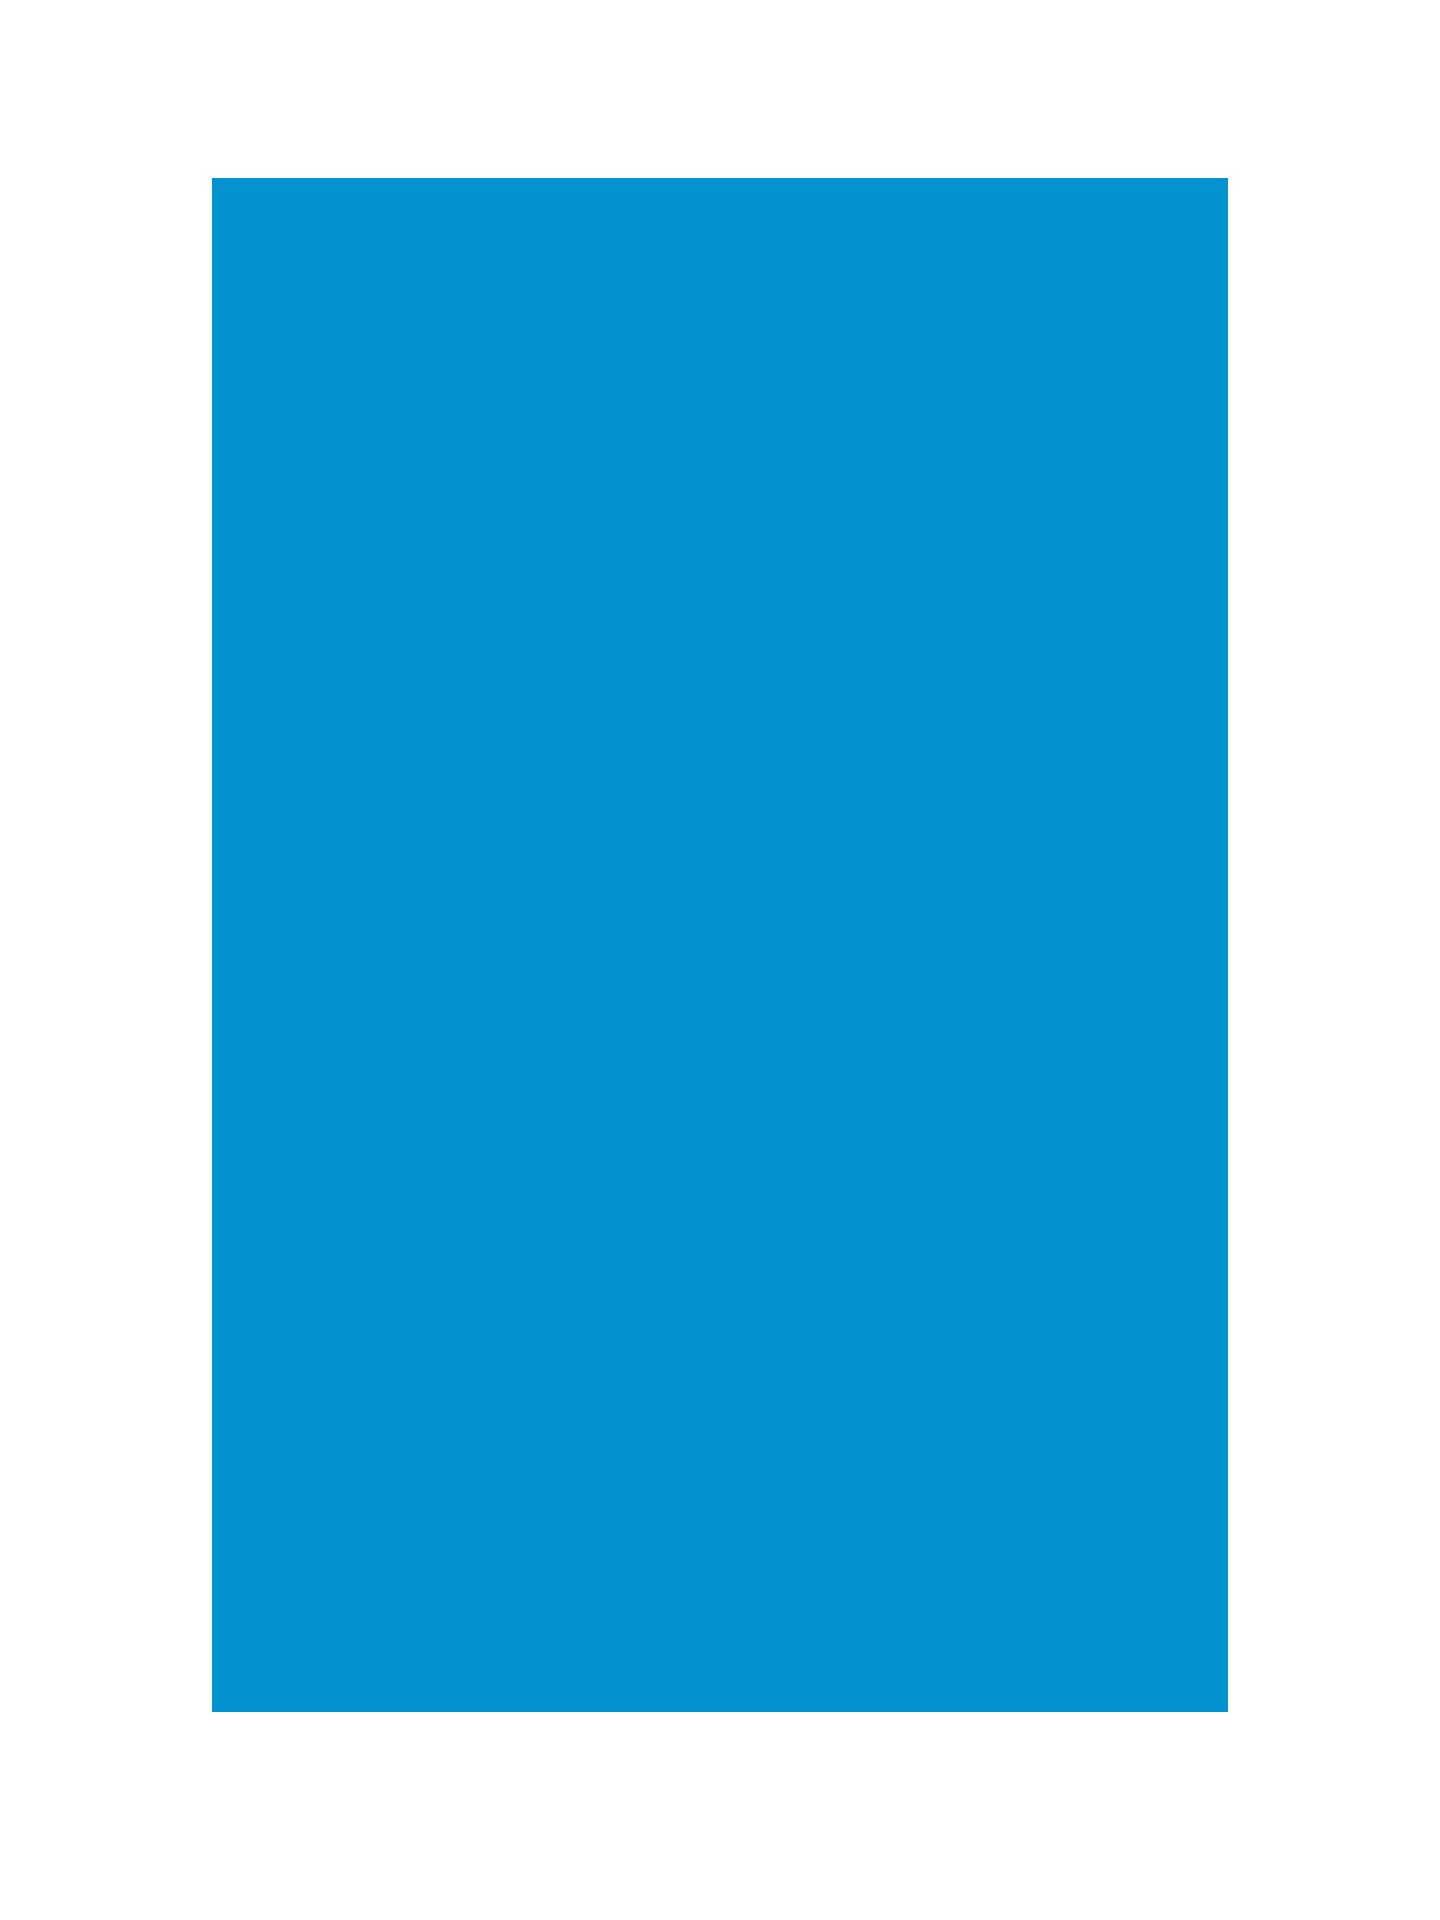 Image Gallery resistance logo